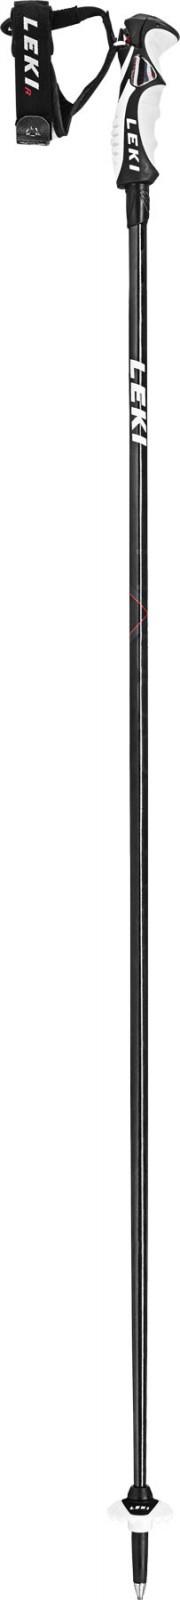 Leki Carbon HX 6.0